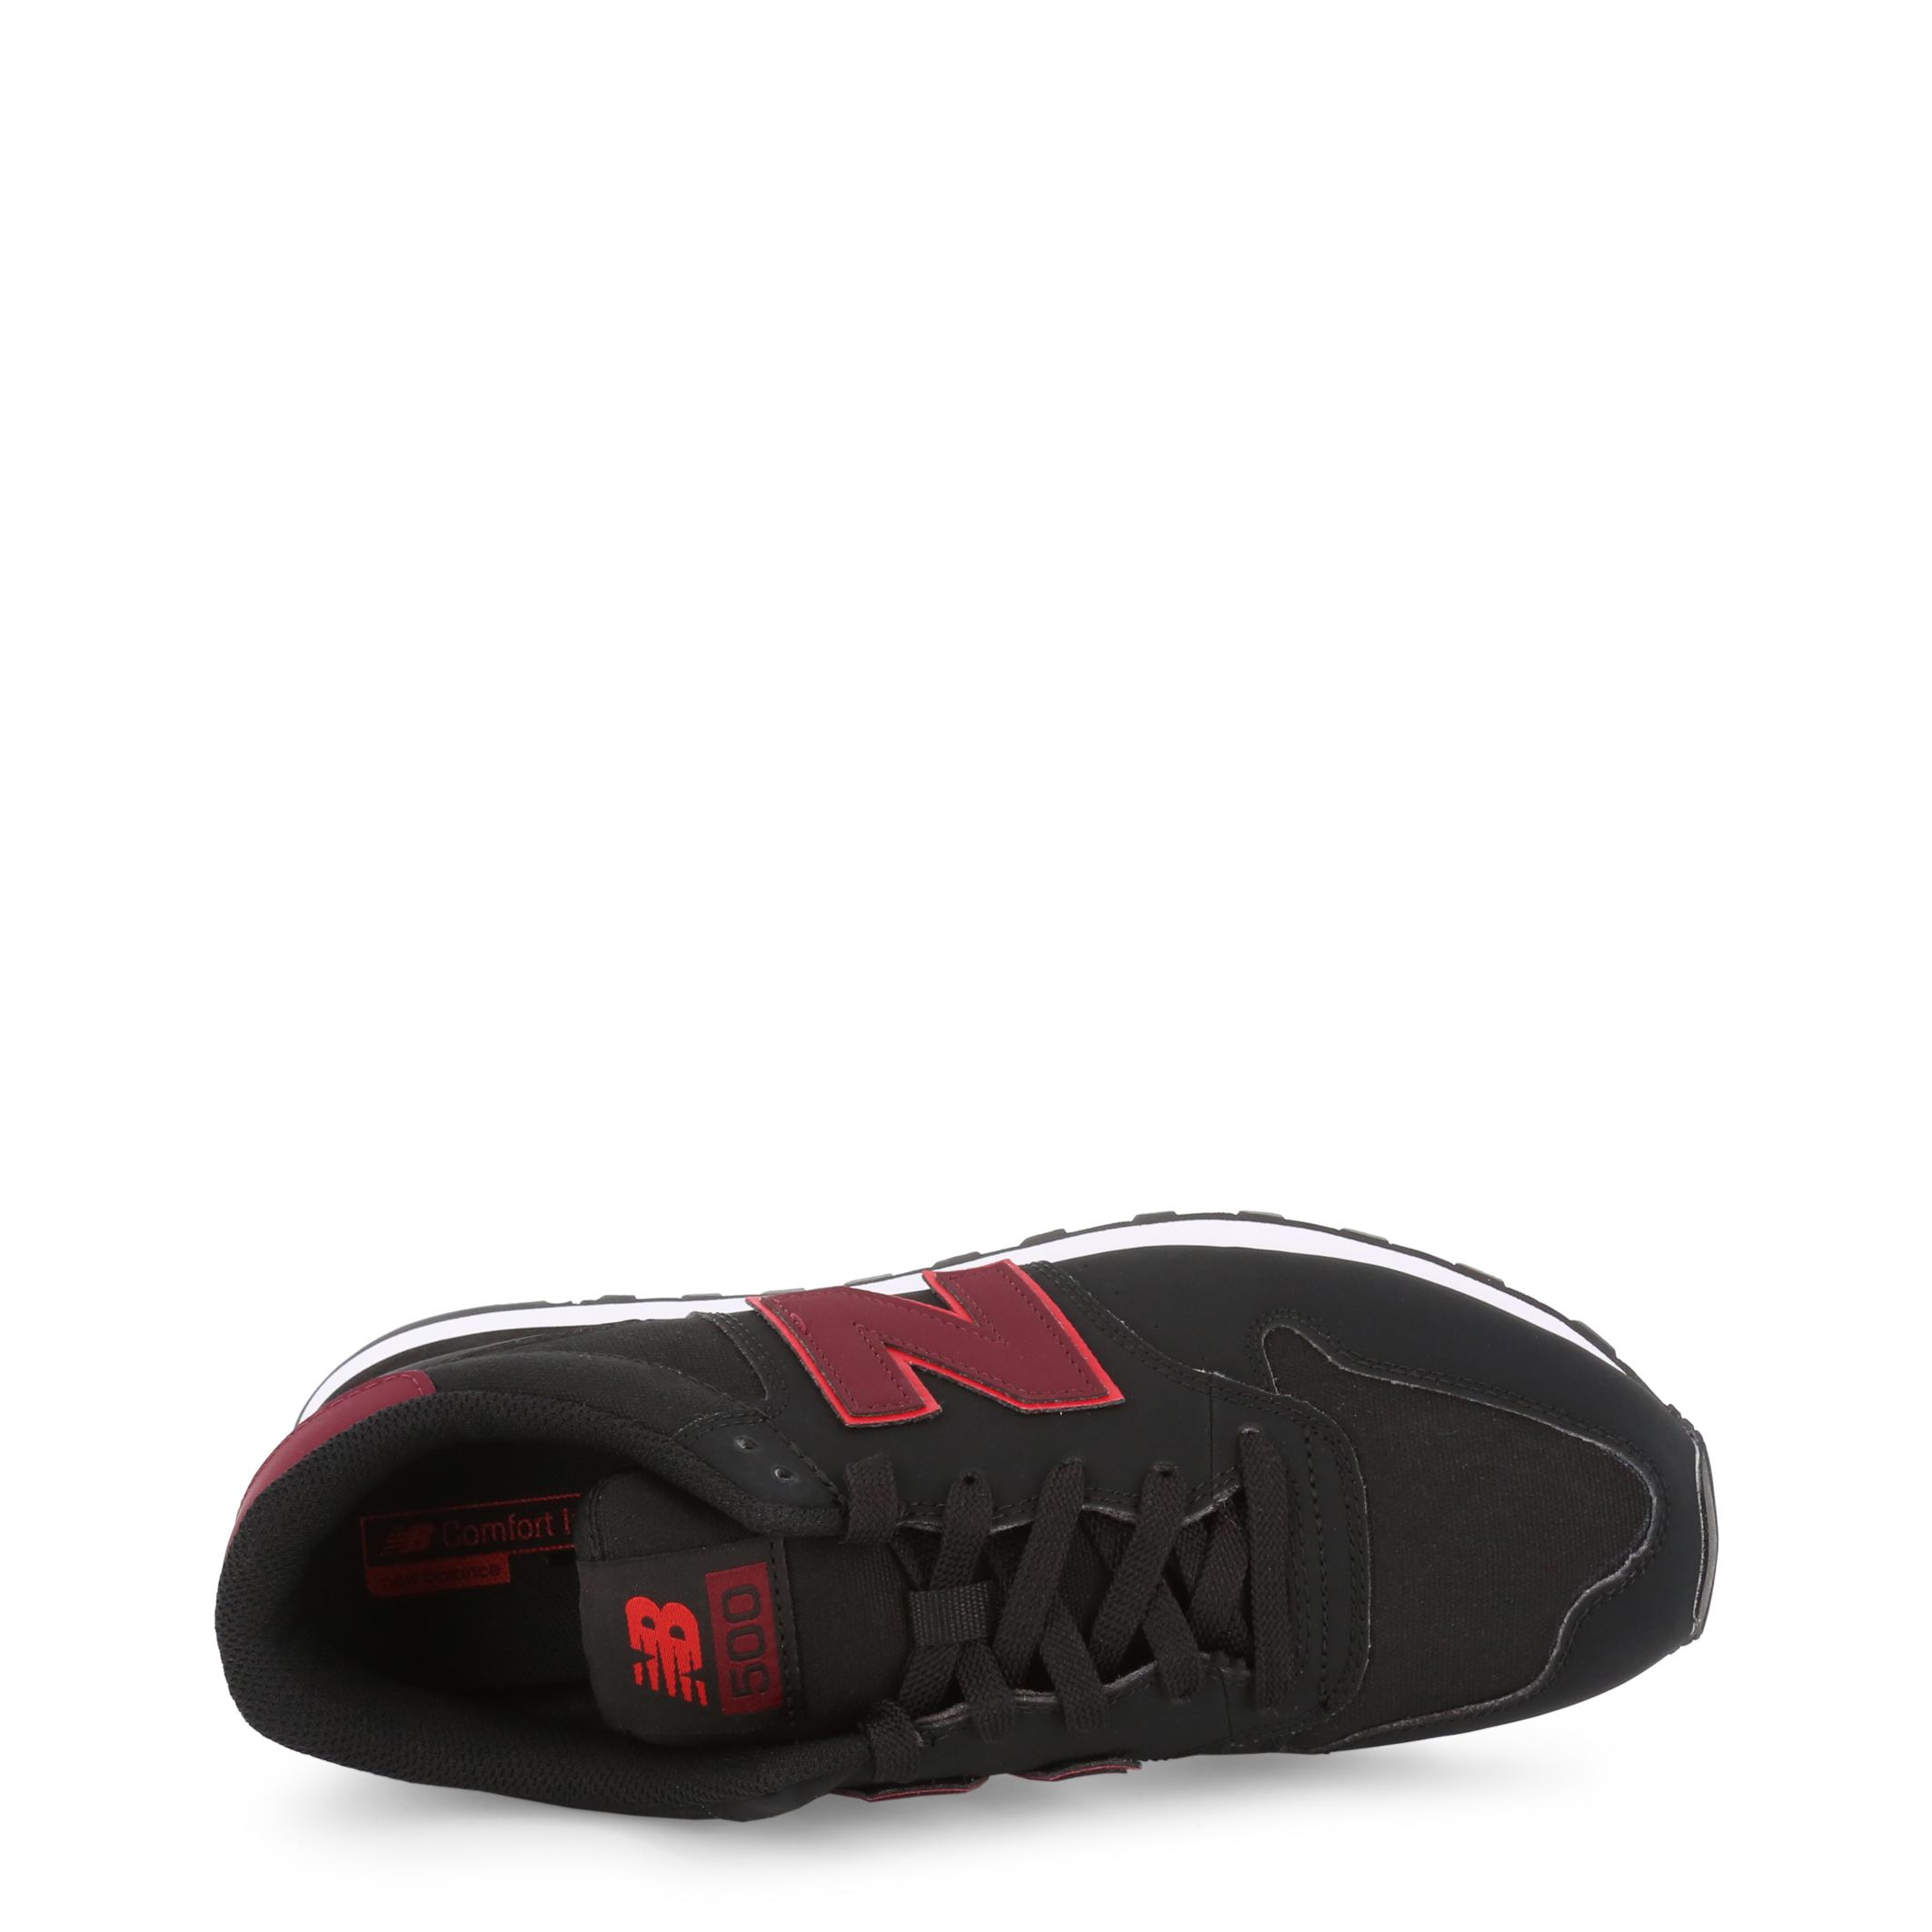 Baskets / Sport  New balance GM500 black